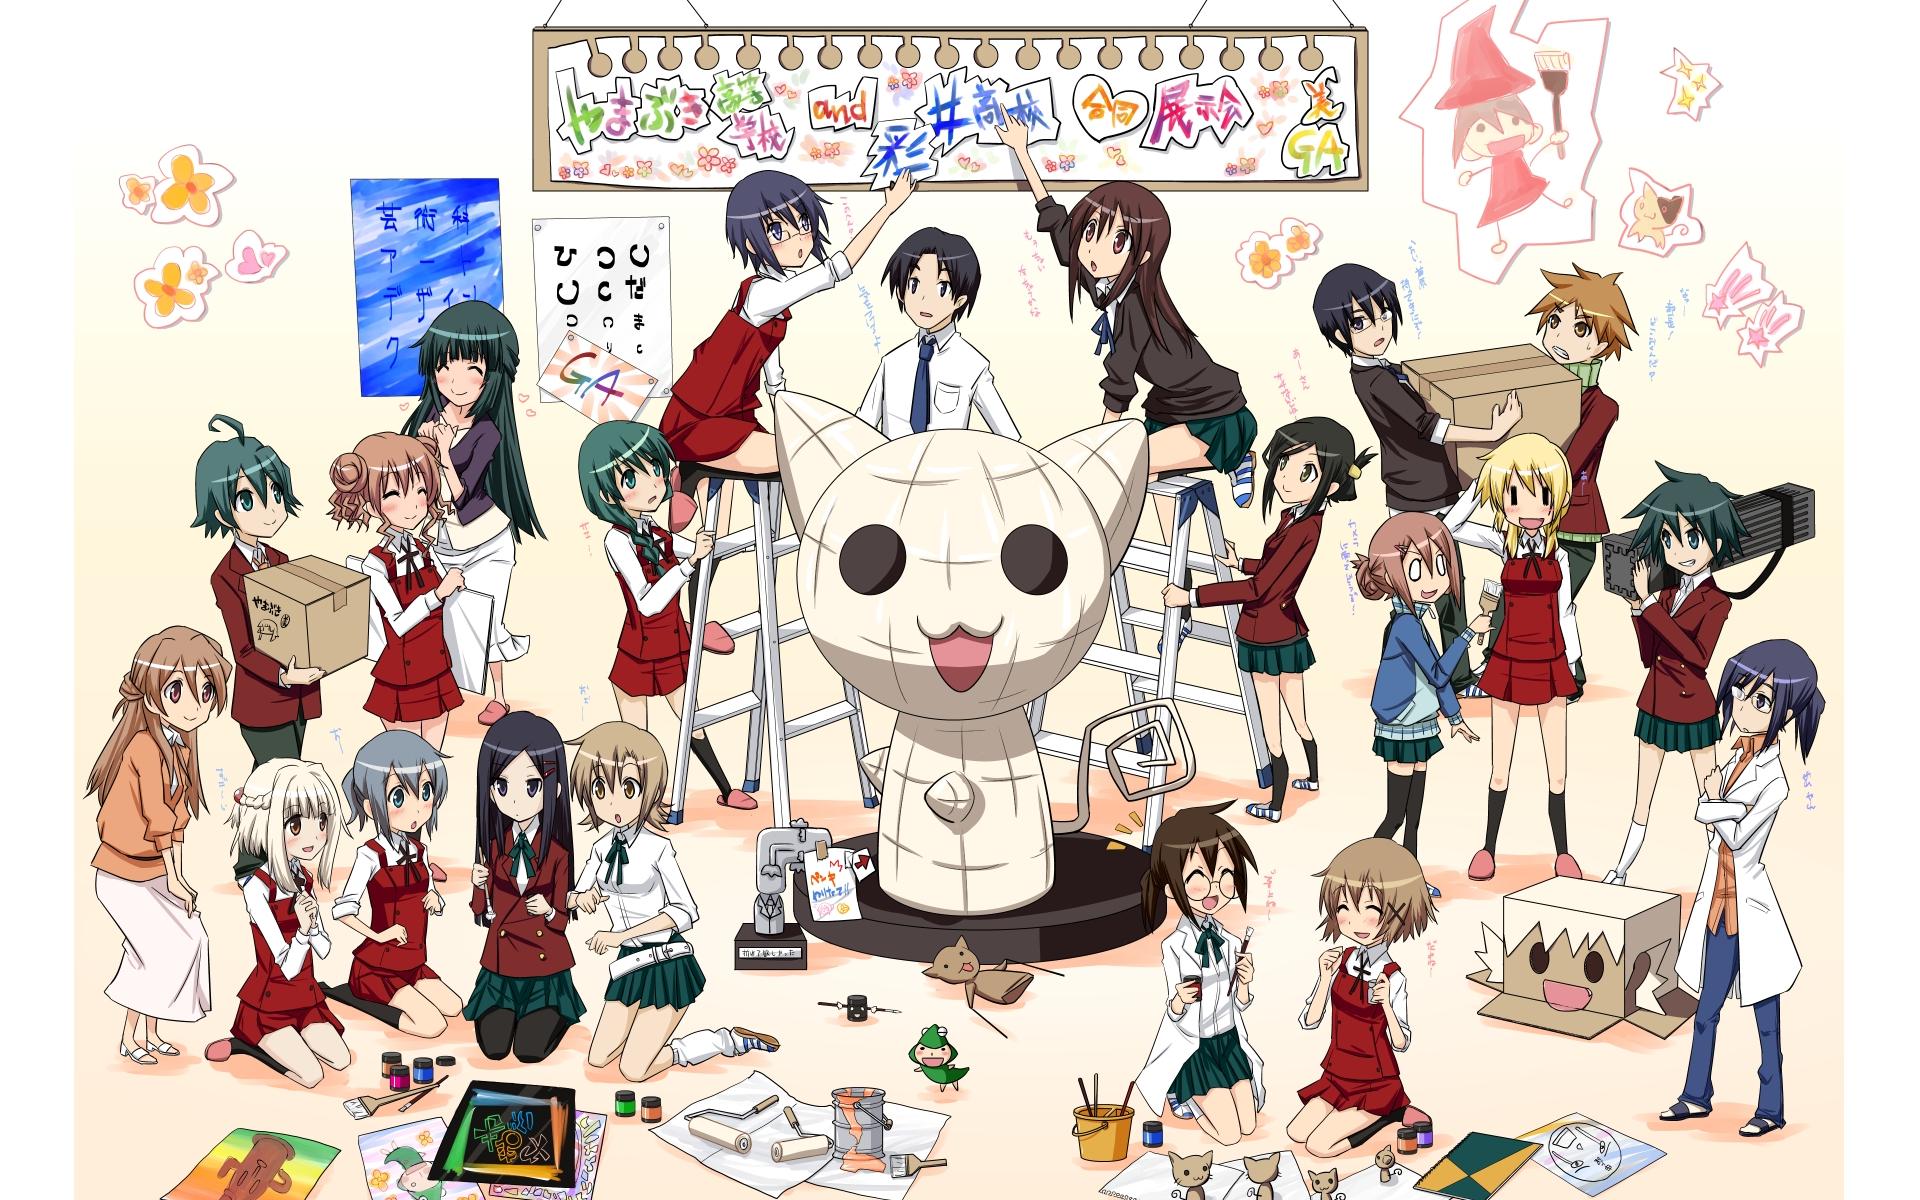 Ga Geijutsuka Art Design Class Characters